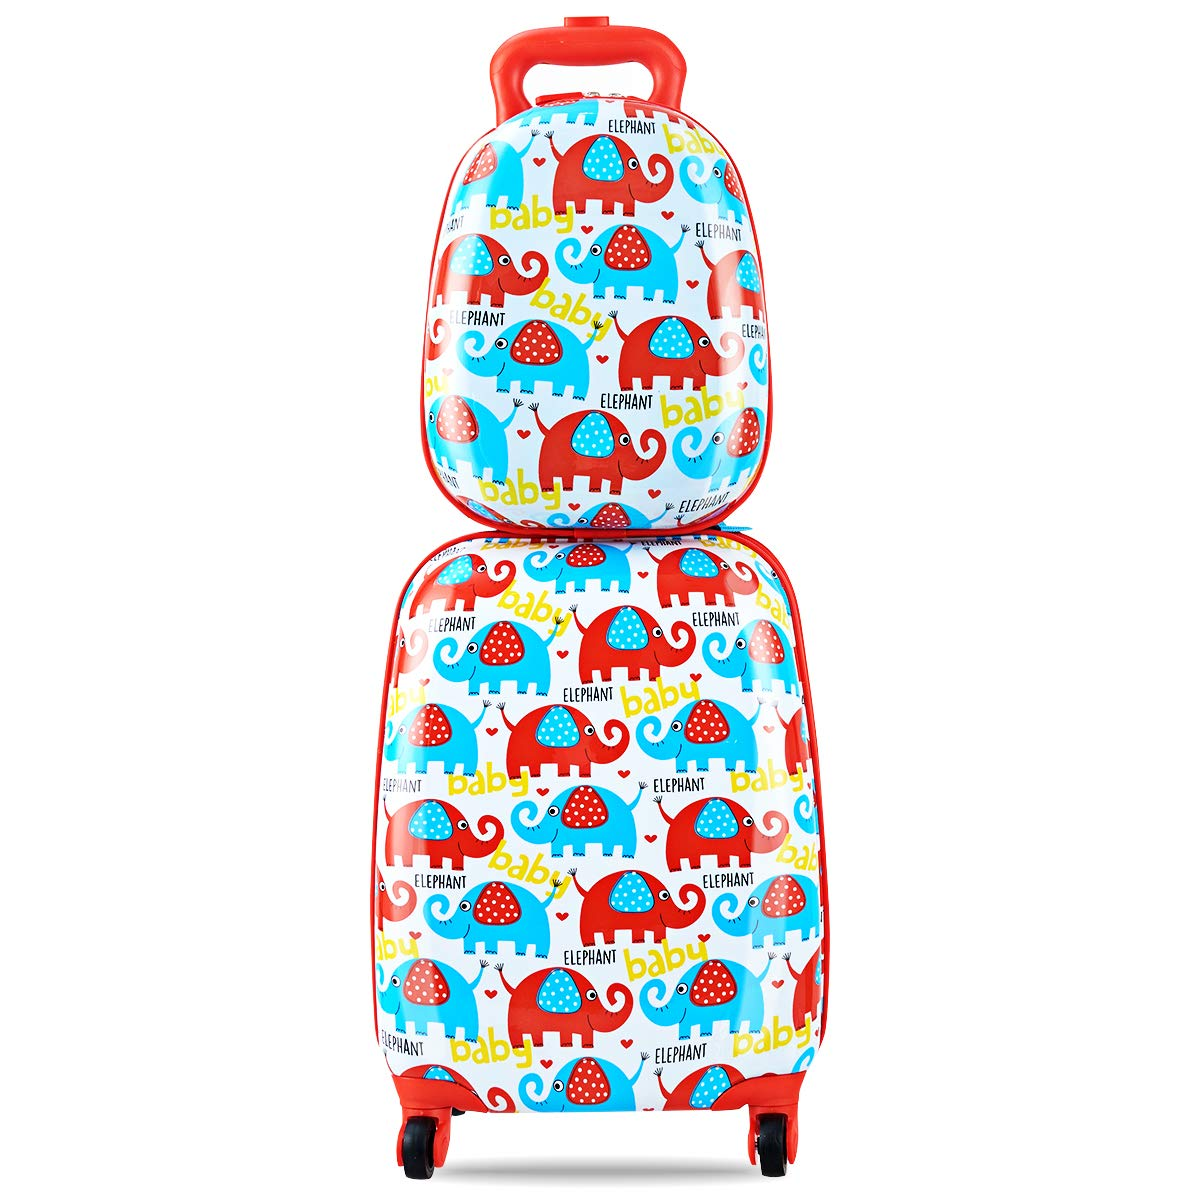 Goplus 2Pc 12'' 16'' Kids Carry On Luggage Set Upright Hard Side Hard Shell Suitcase Travel Trolley ABS (Elephant)